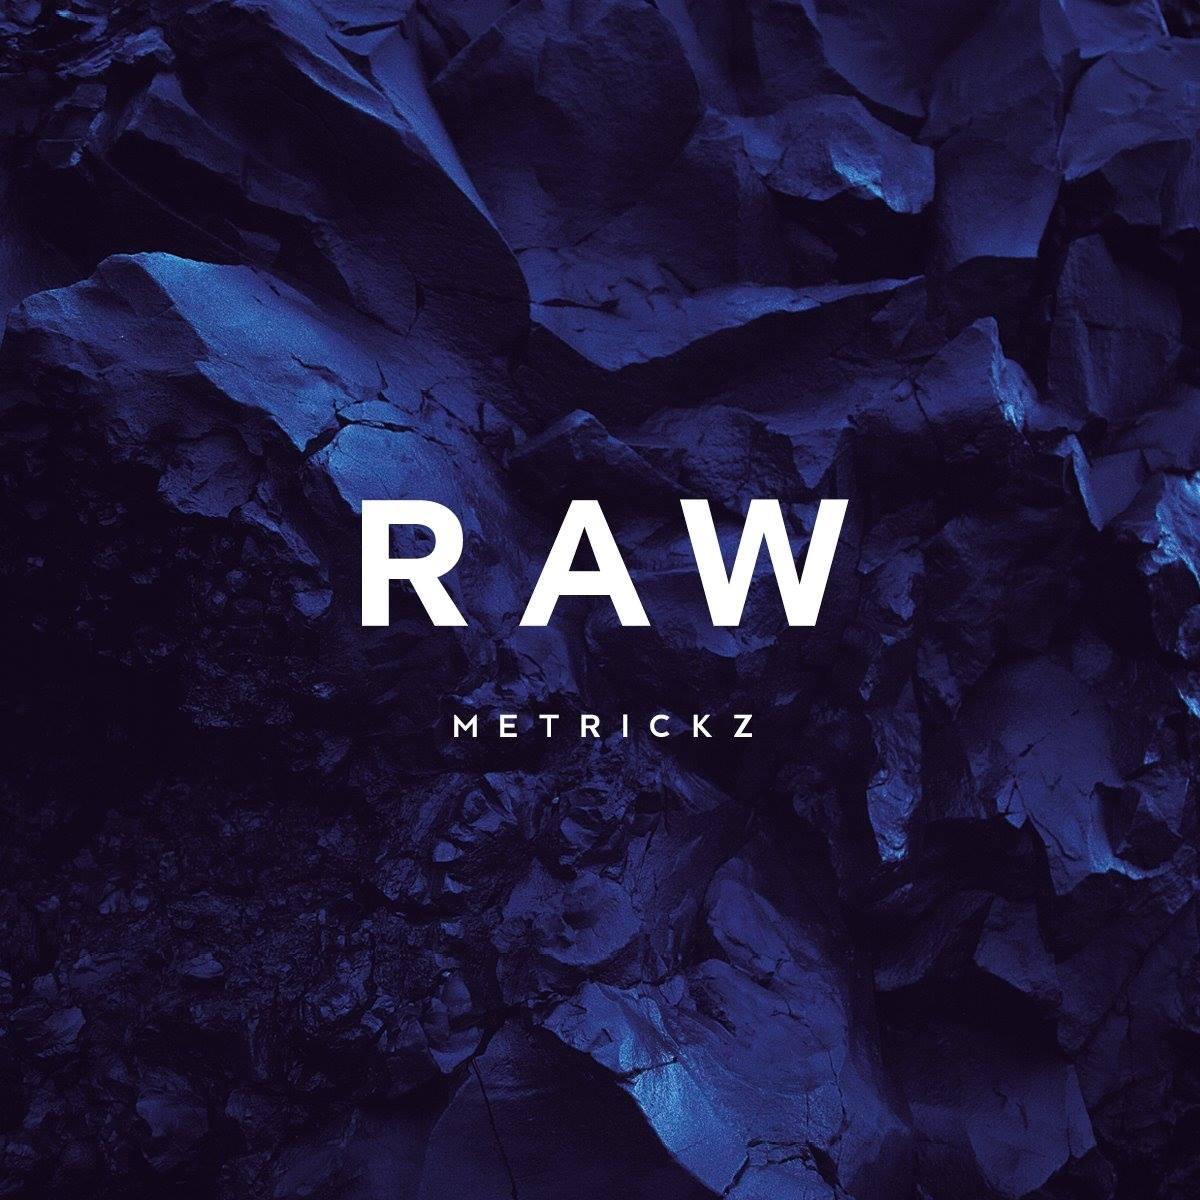 metrickz-raw